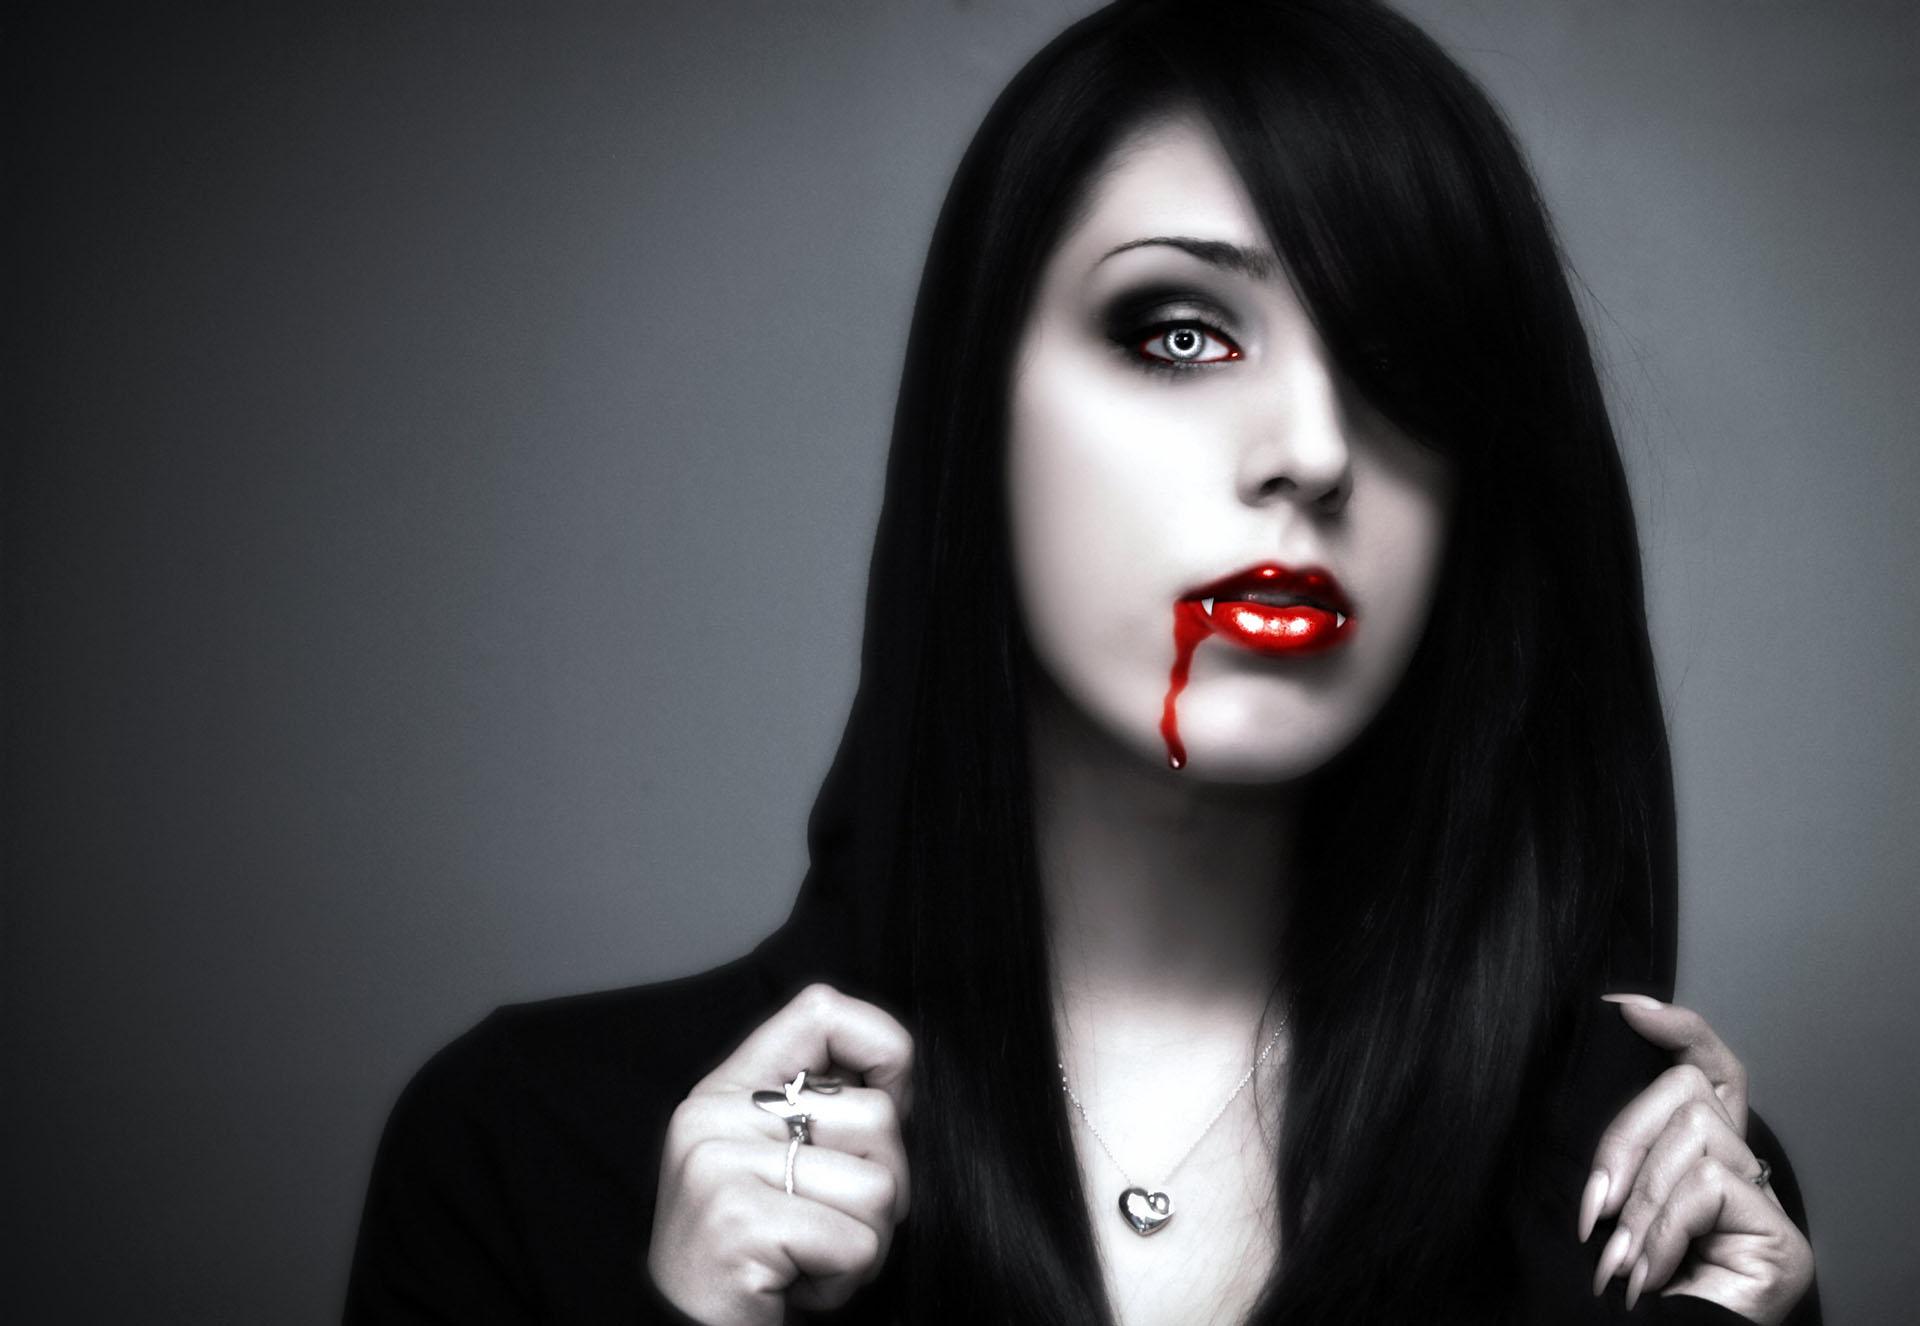 Vampire Goth Girl